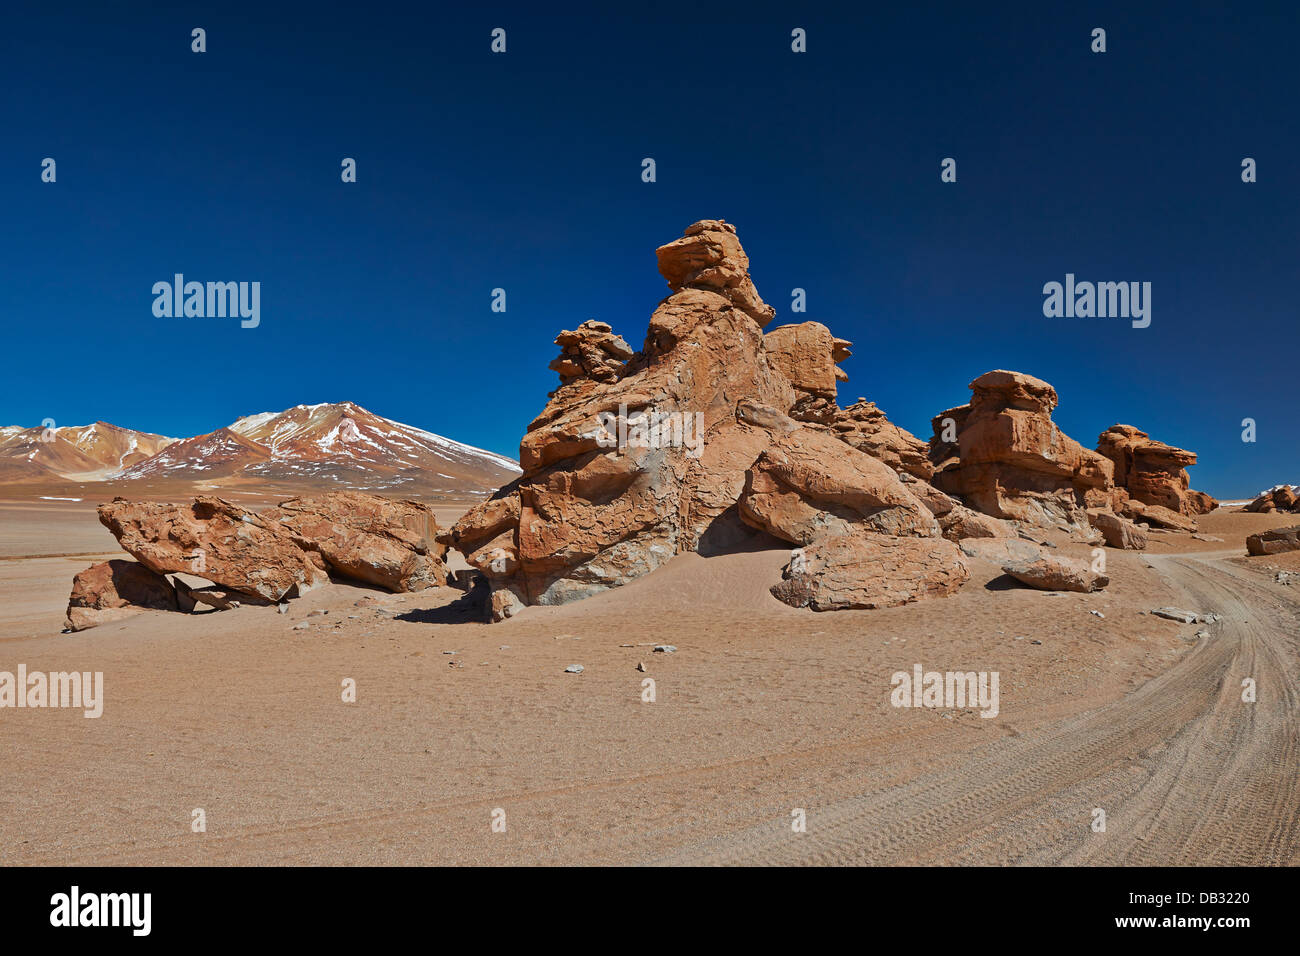 erosion landscape with rocks and mountains, Reserva Nacional de Fauna Andina Eduardo Abaroa, Bolivia, South America - Stock Image